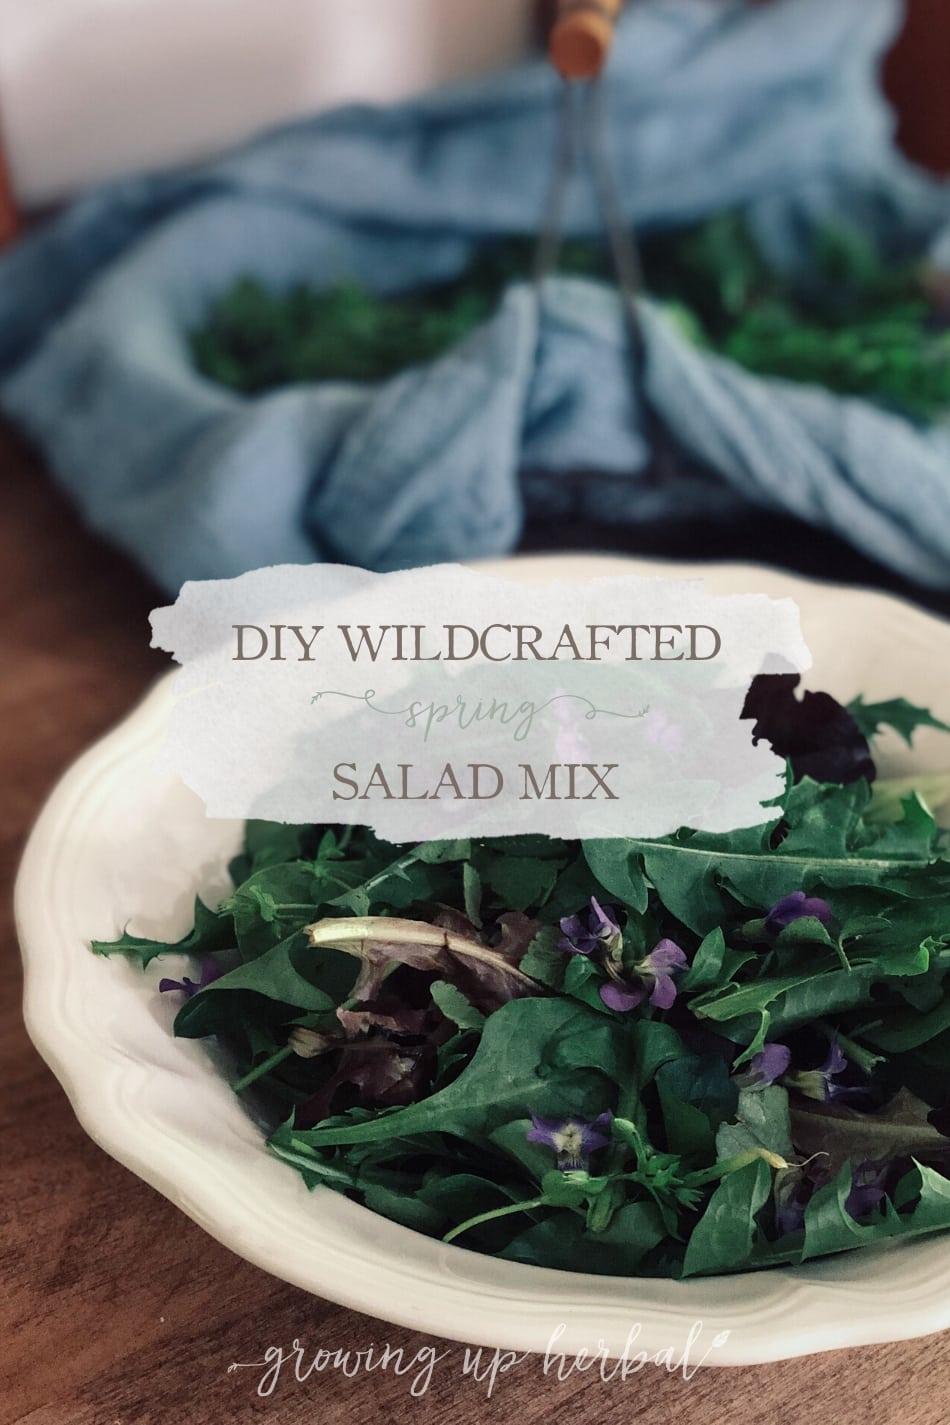 DIY Wildcrafted Spring Salad Mix